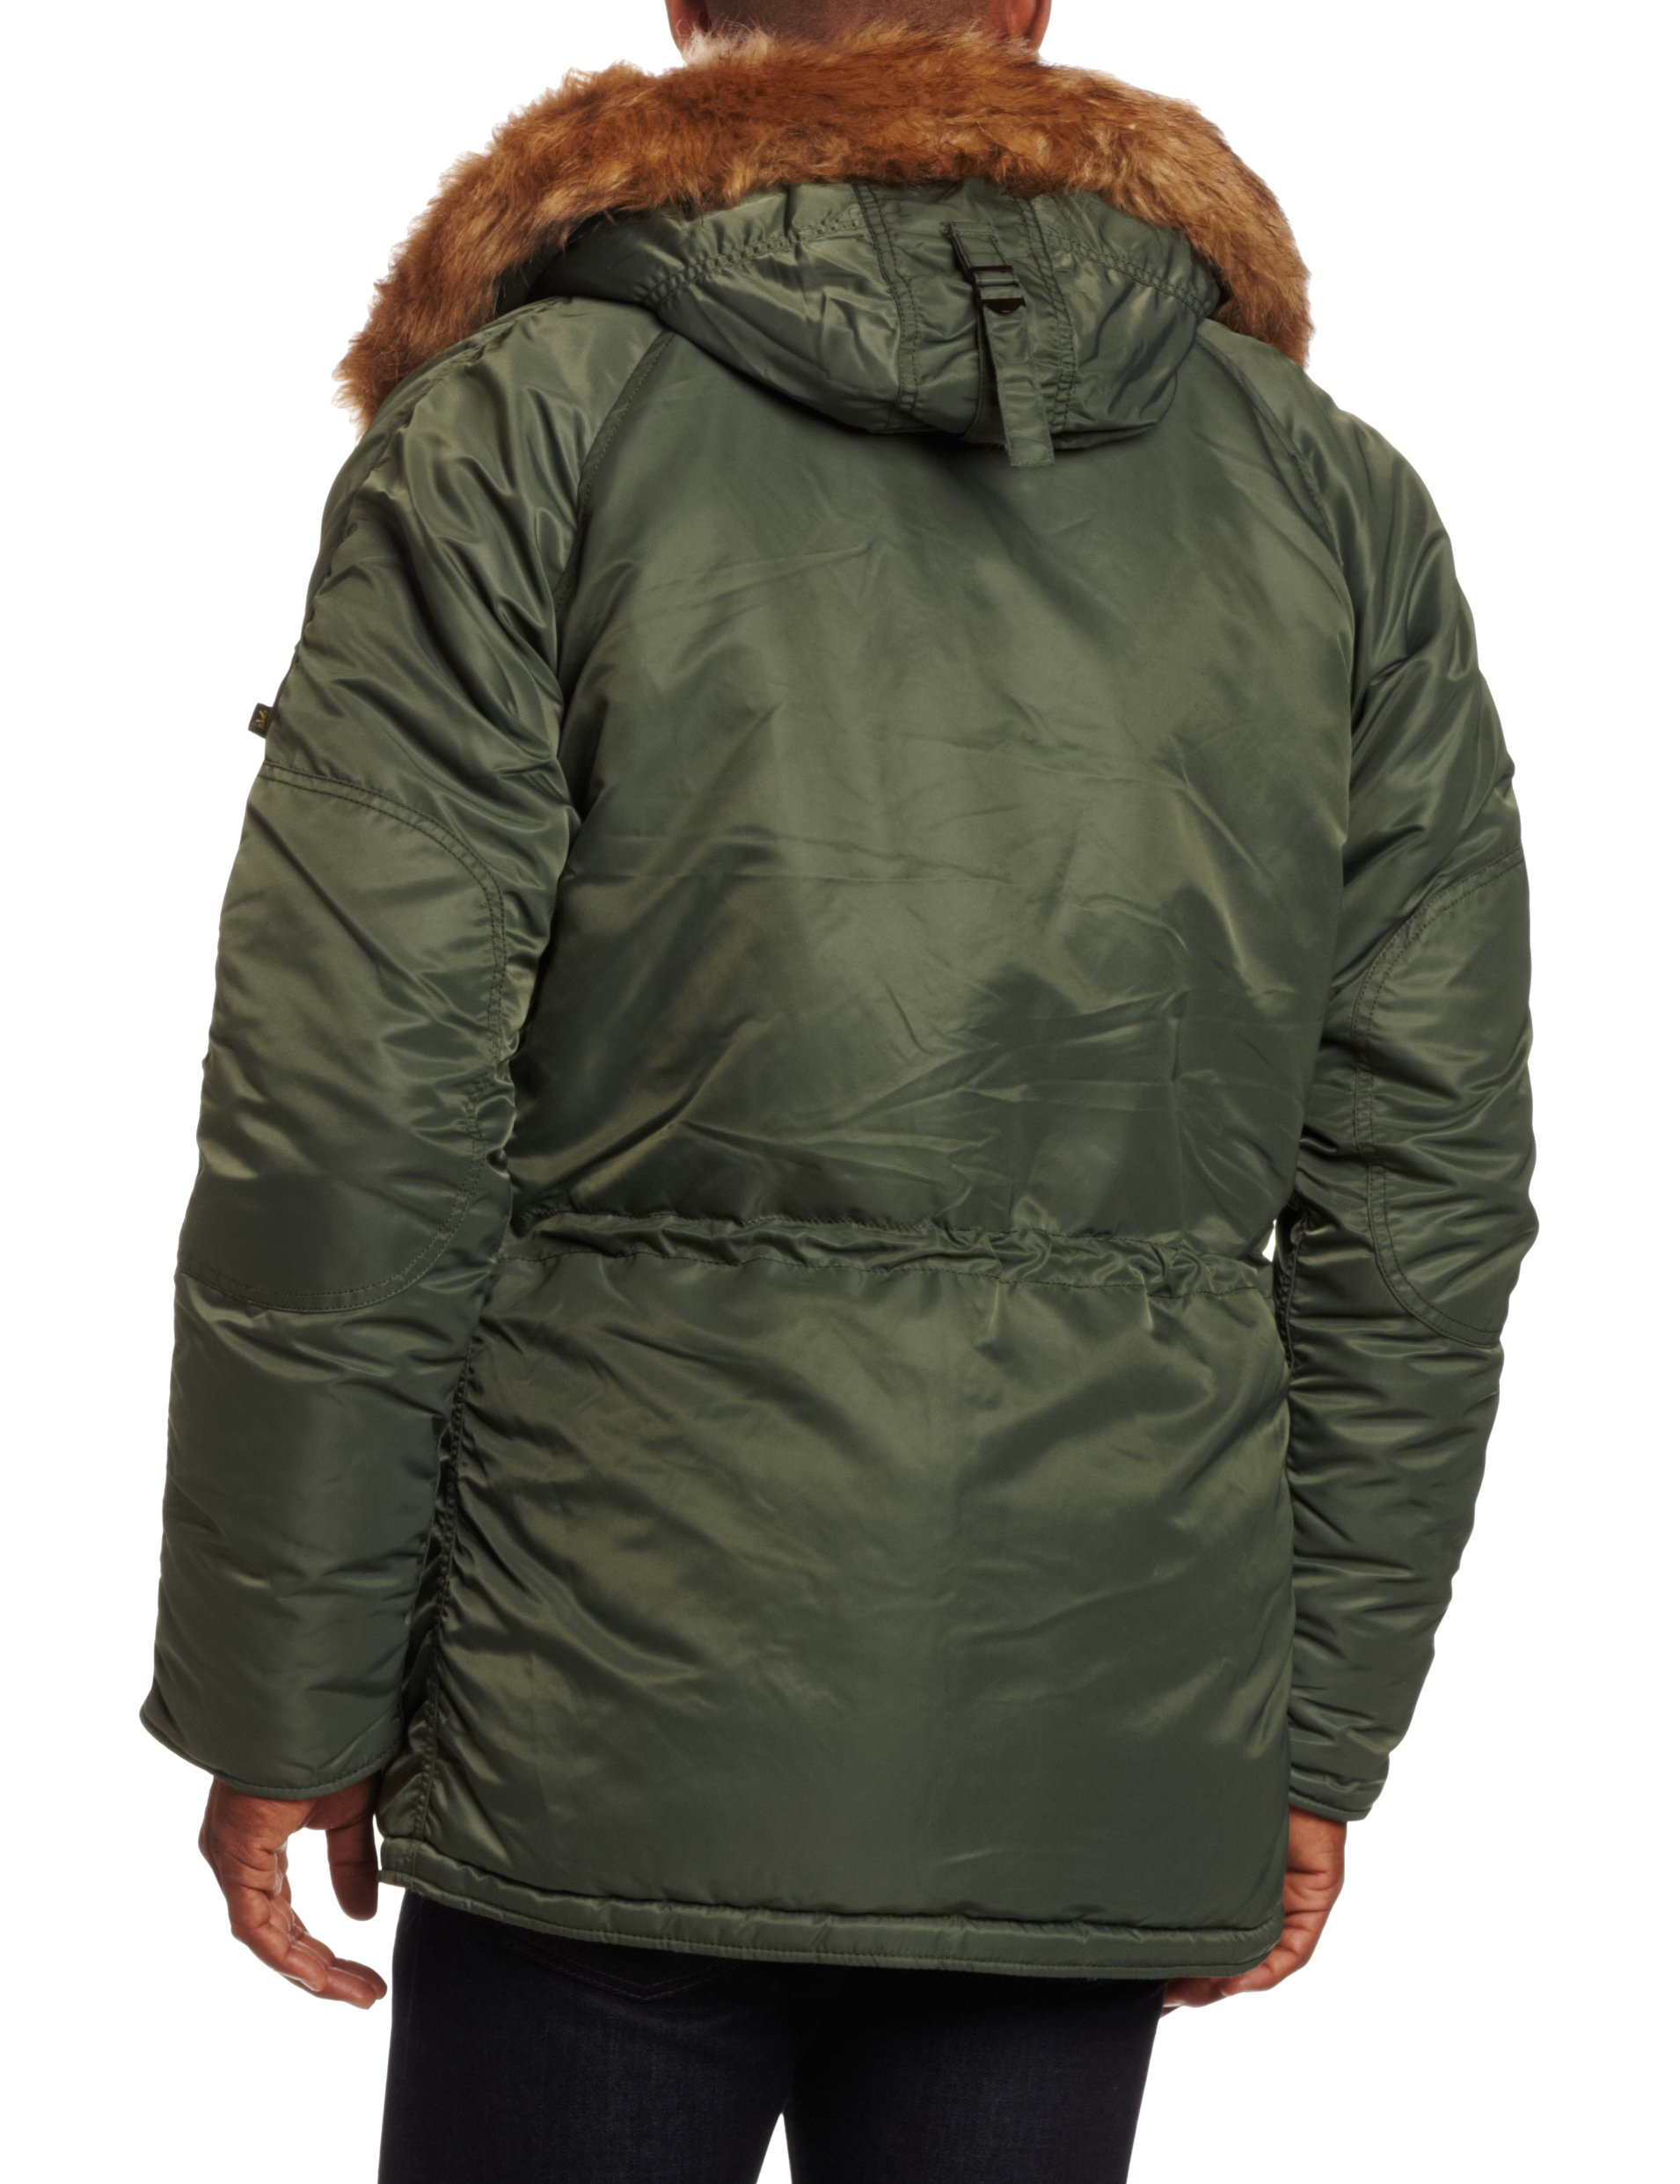 Alpha Industries Men's N-3B Slim-Fit Parka Jacket with Removable Faux-Fur Hood Trim, Sage/Orange, 5X-Large by Alpha Industries (Image #2)